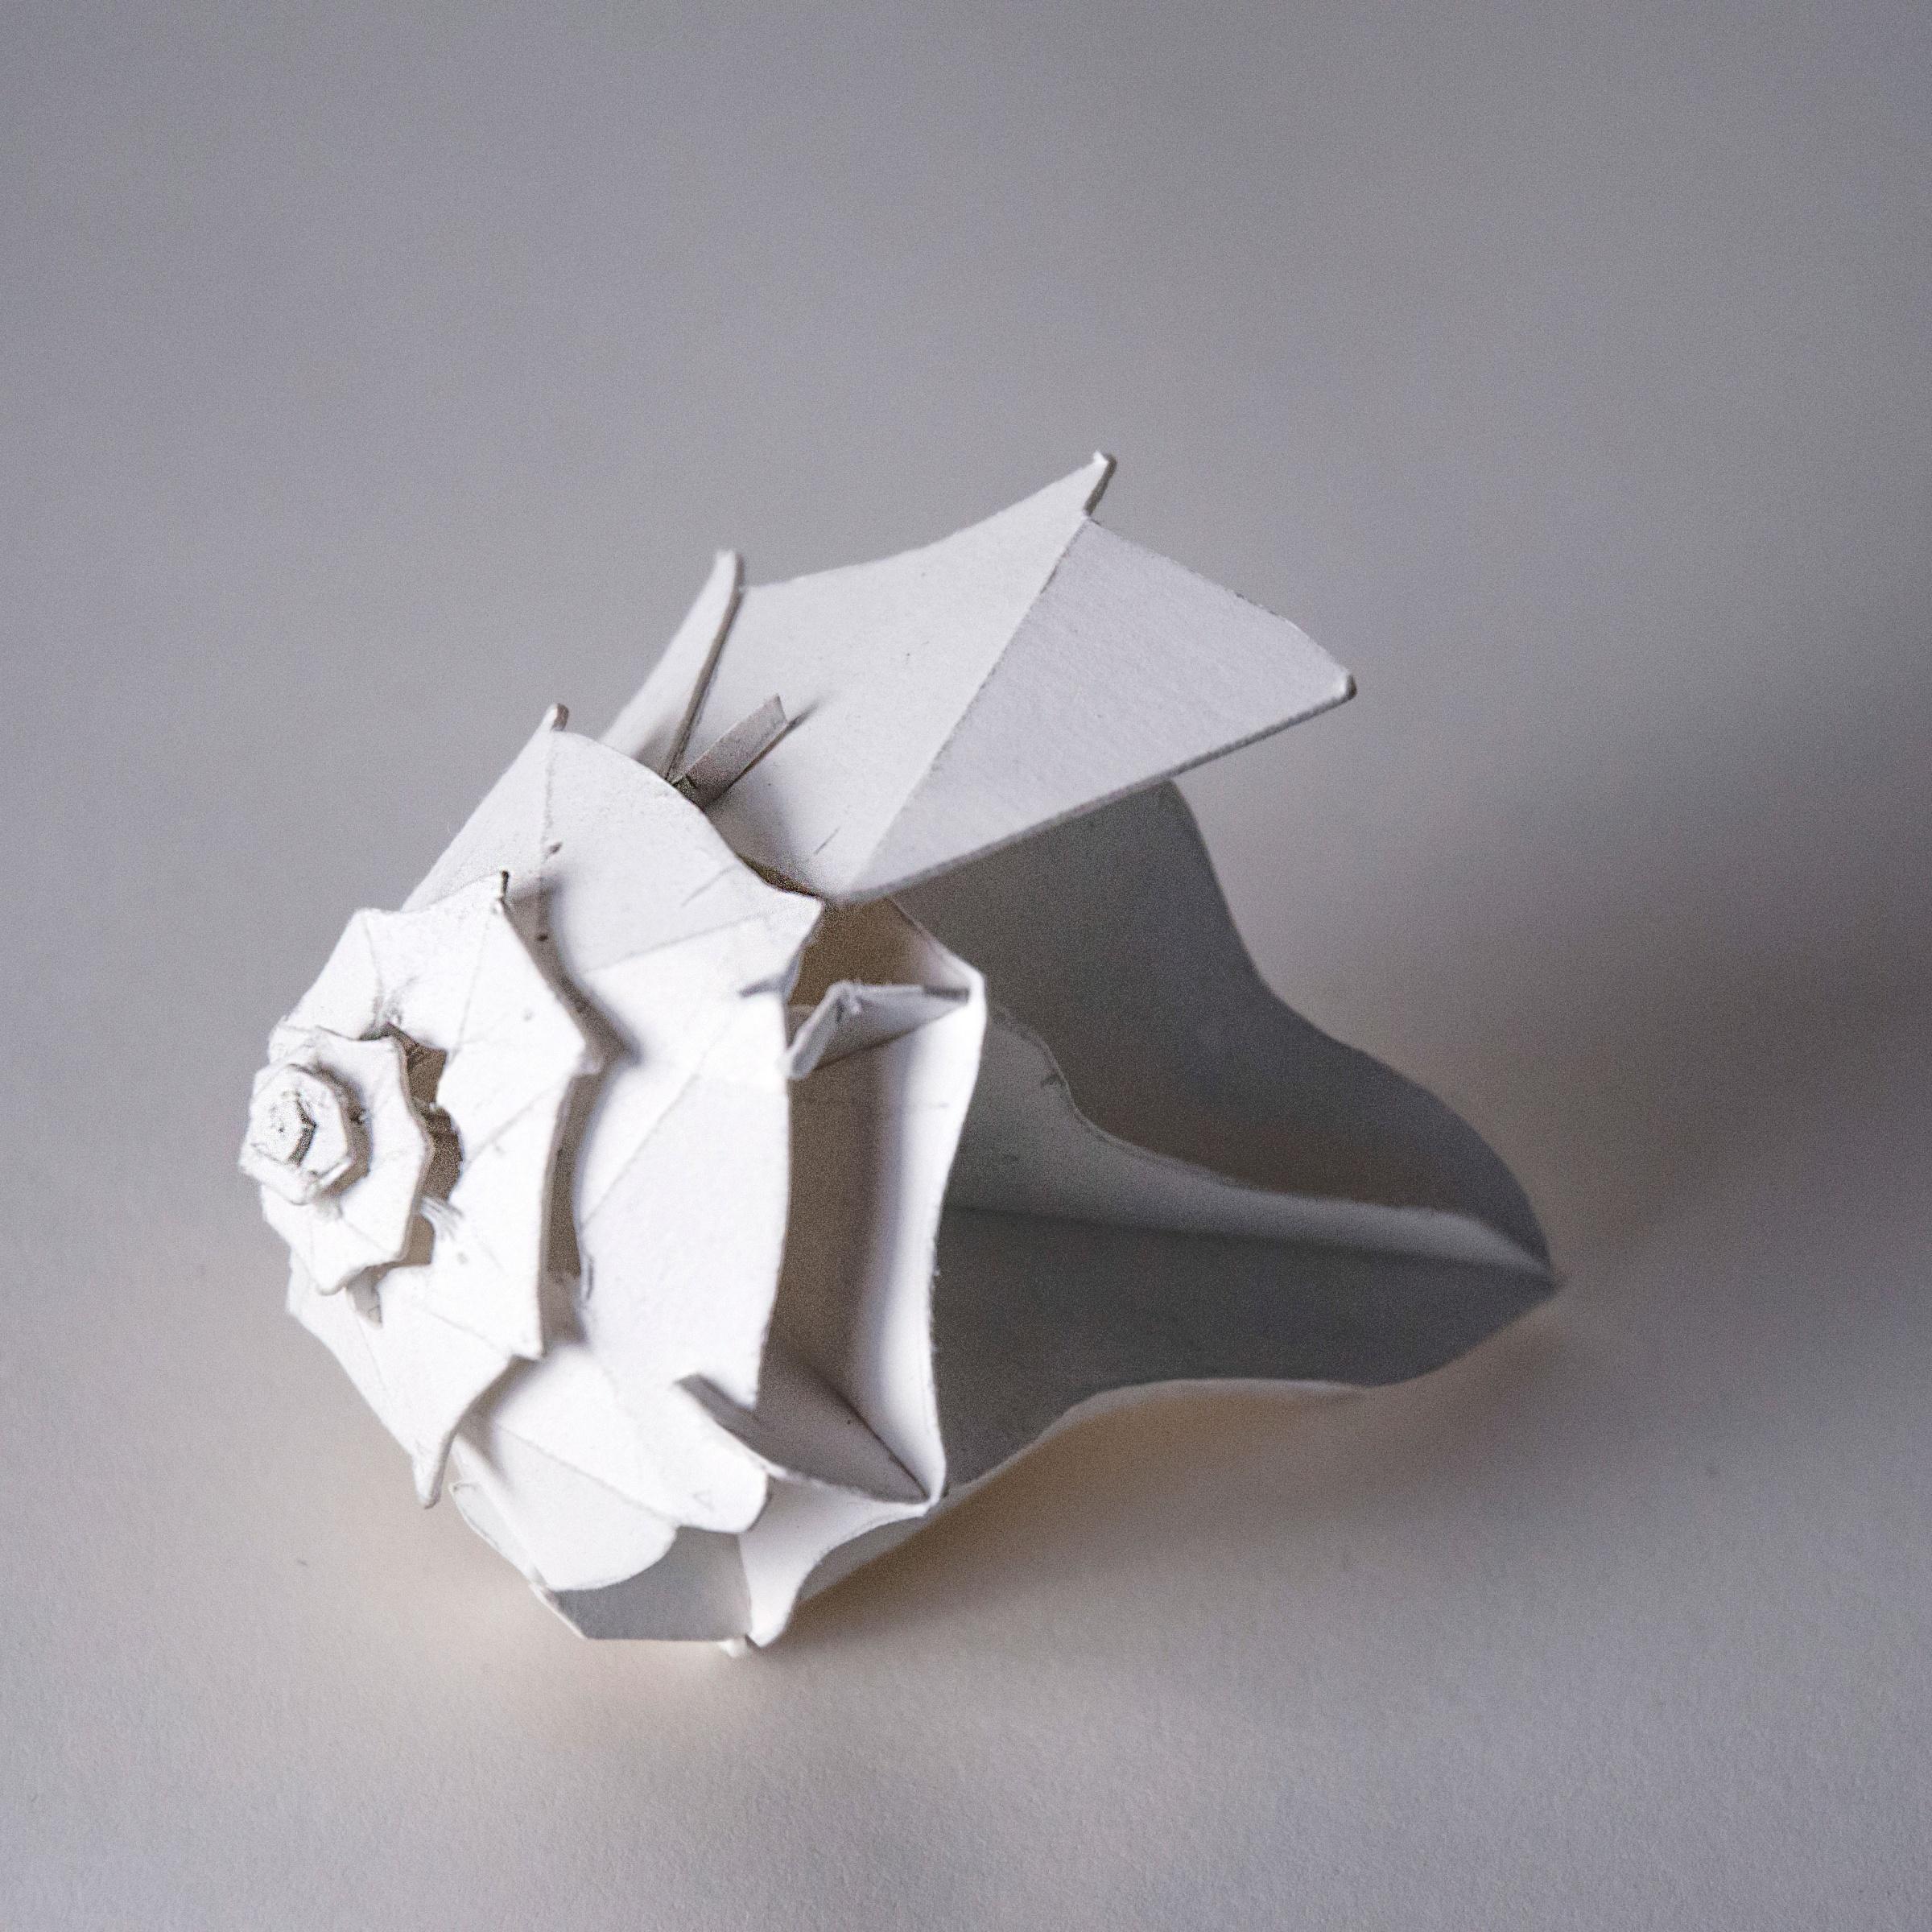 Origami Spiral Snail Shell (Toshikazu Kawasaki) - YouTube | 2400x2400